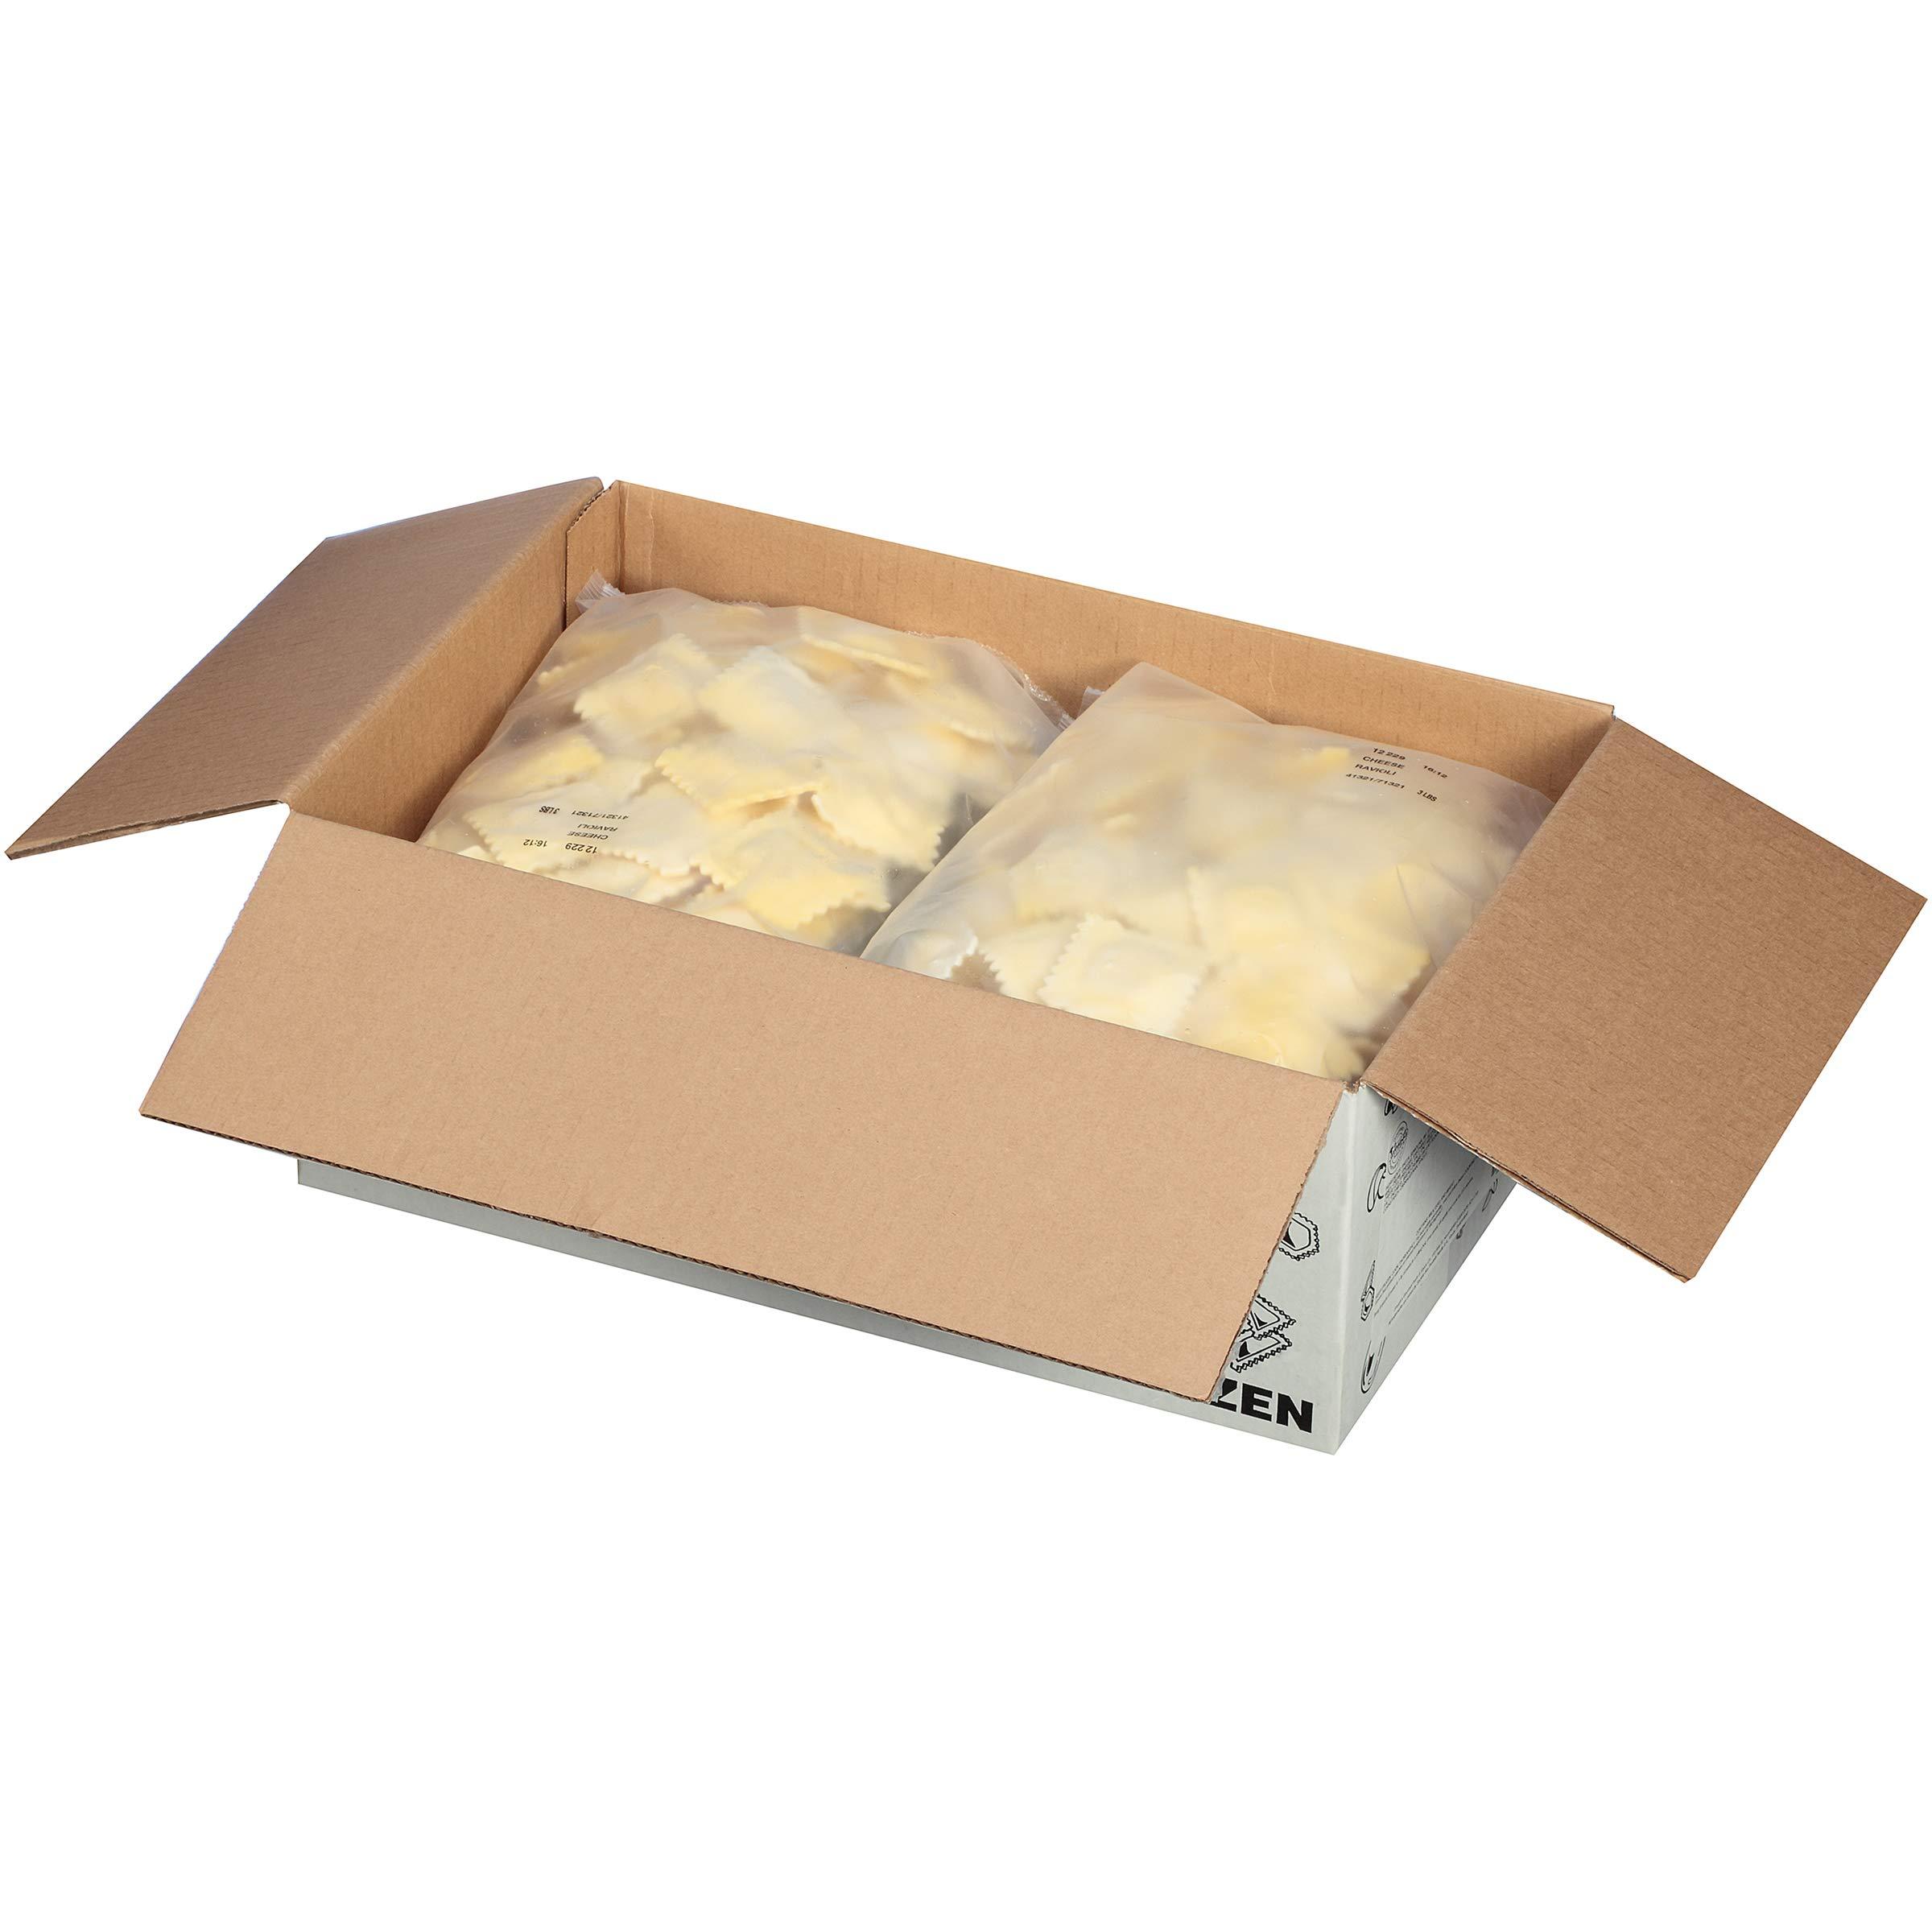 Joseph's Gourmet Pasta Three Cheese Ravioli 3 lb (Pack of 4)